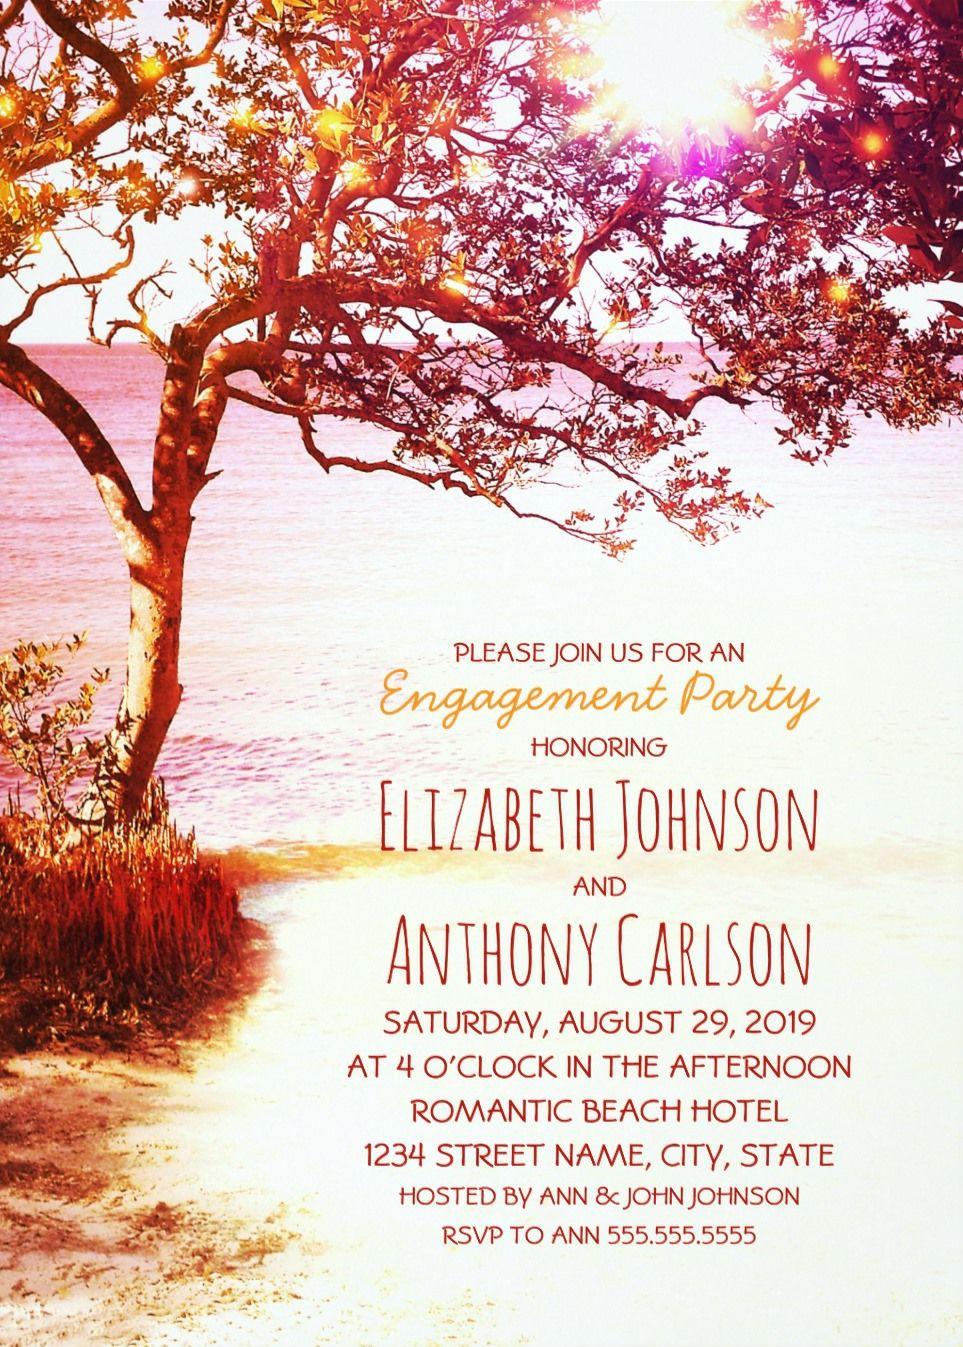 Whimsical Engagement Party Invitations Tree Sunset Lake Beach | Lake ...